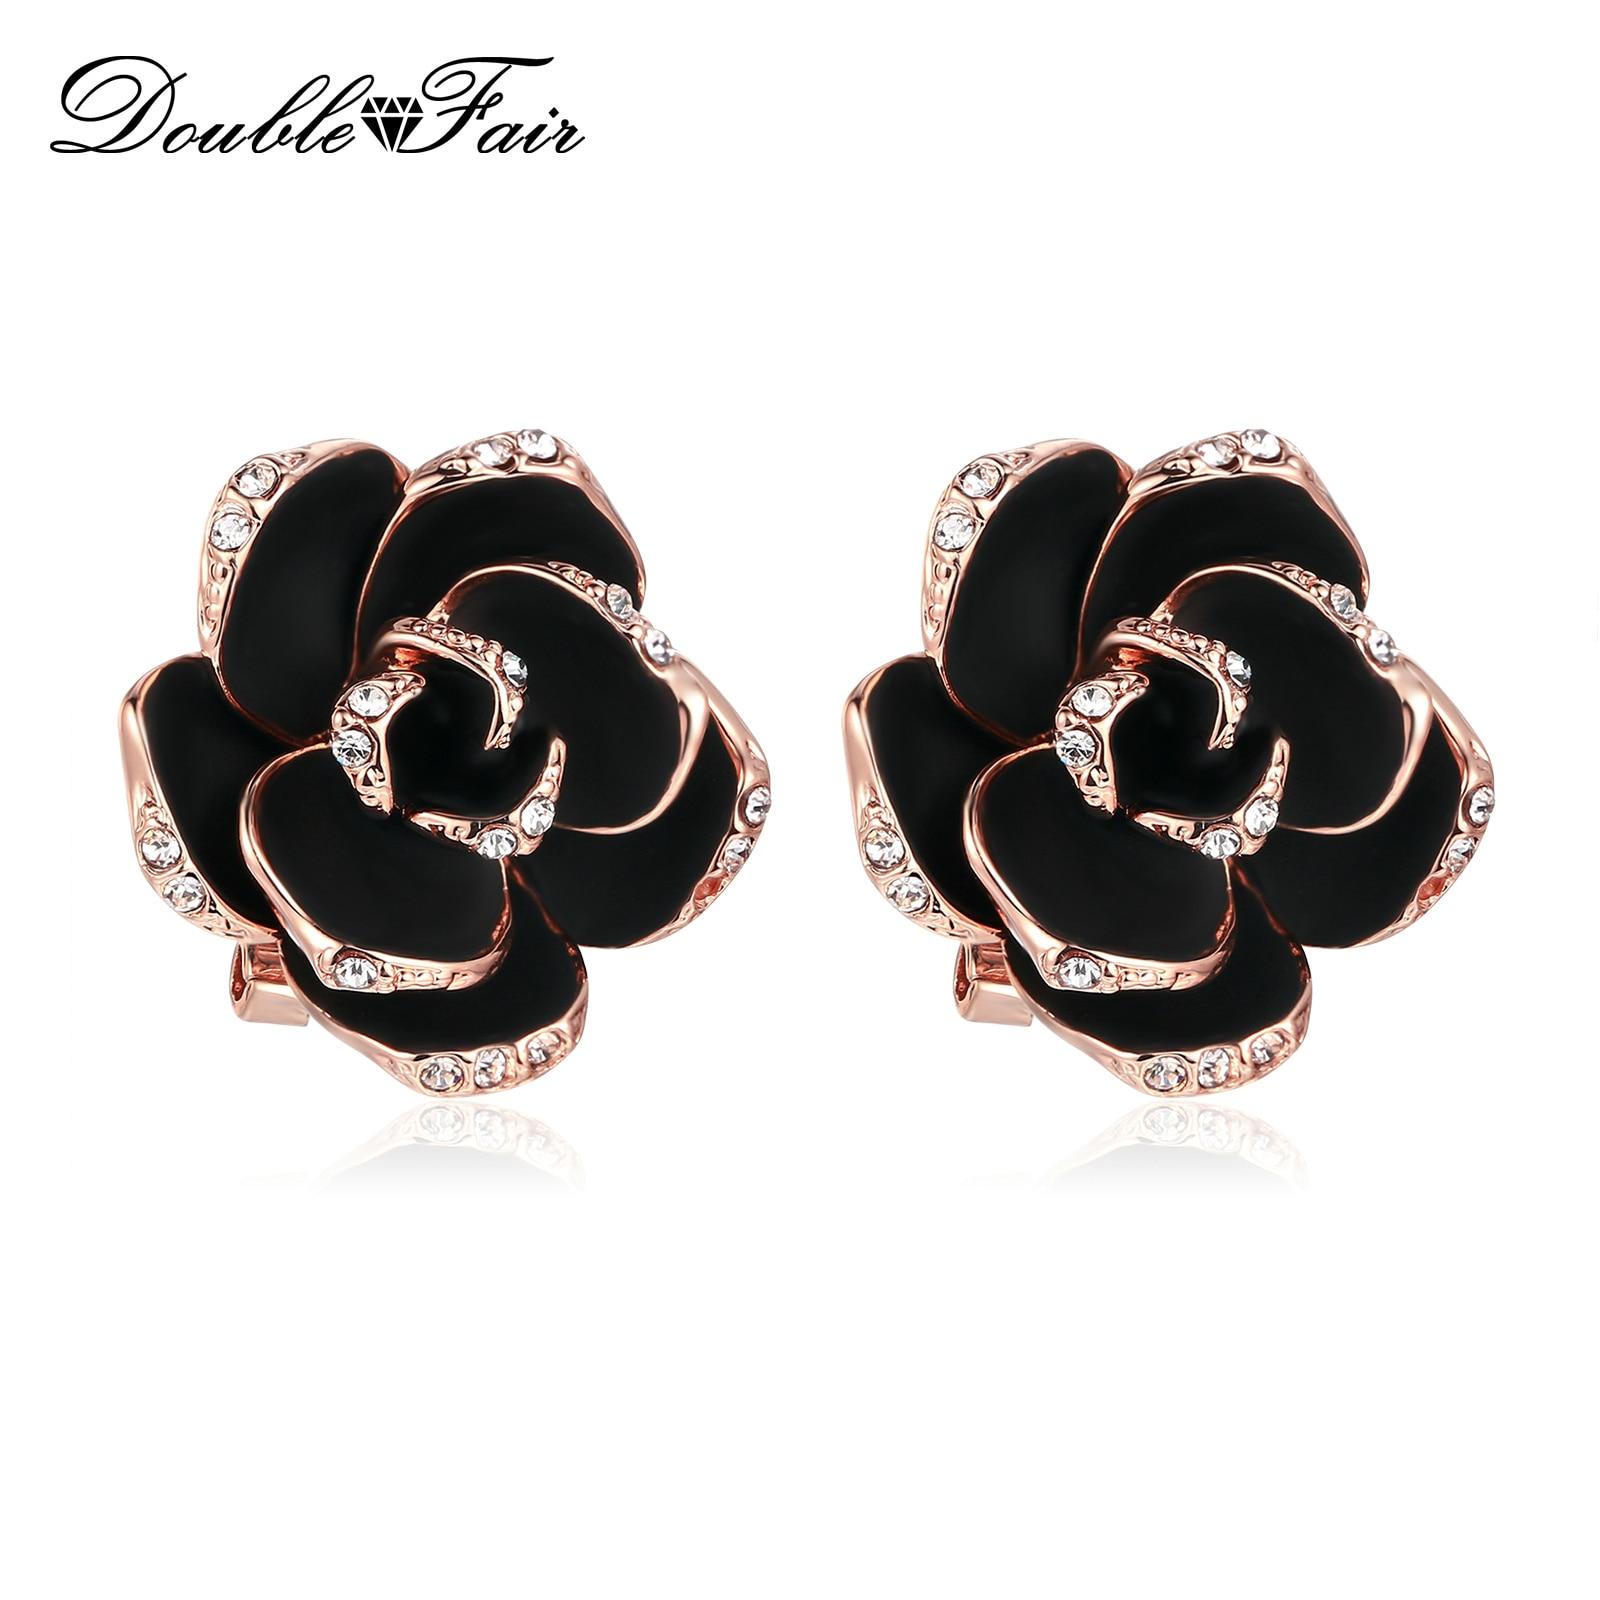 Double Fair Mosaic Black Rose Flower Crystal Stud Earrings Rose Gold